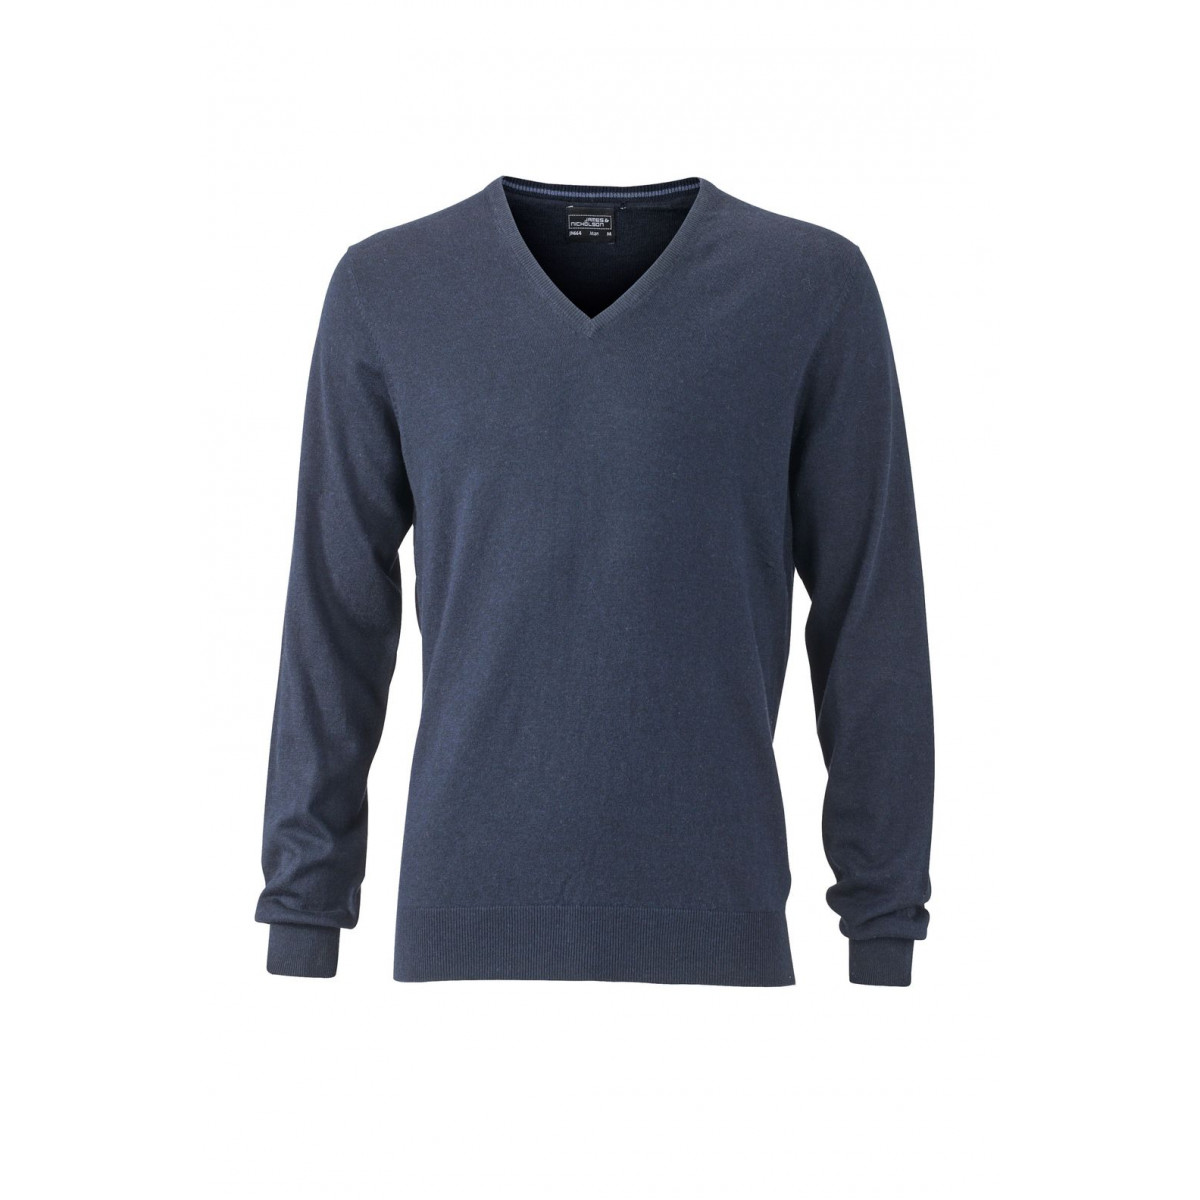 Пуловер мужской JN664 Mens Pullover - Темно-синий меланж